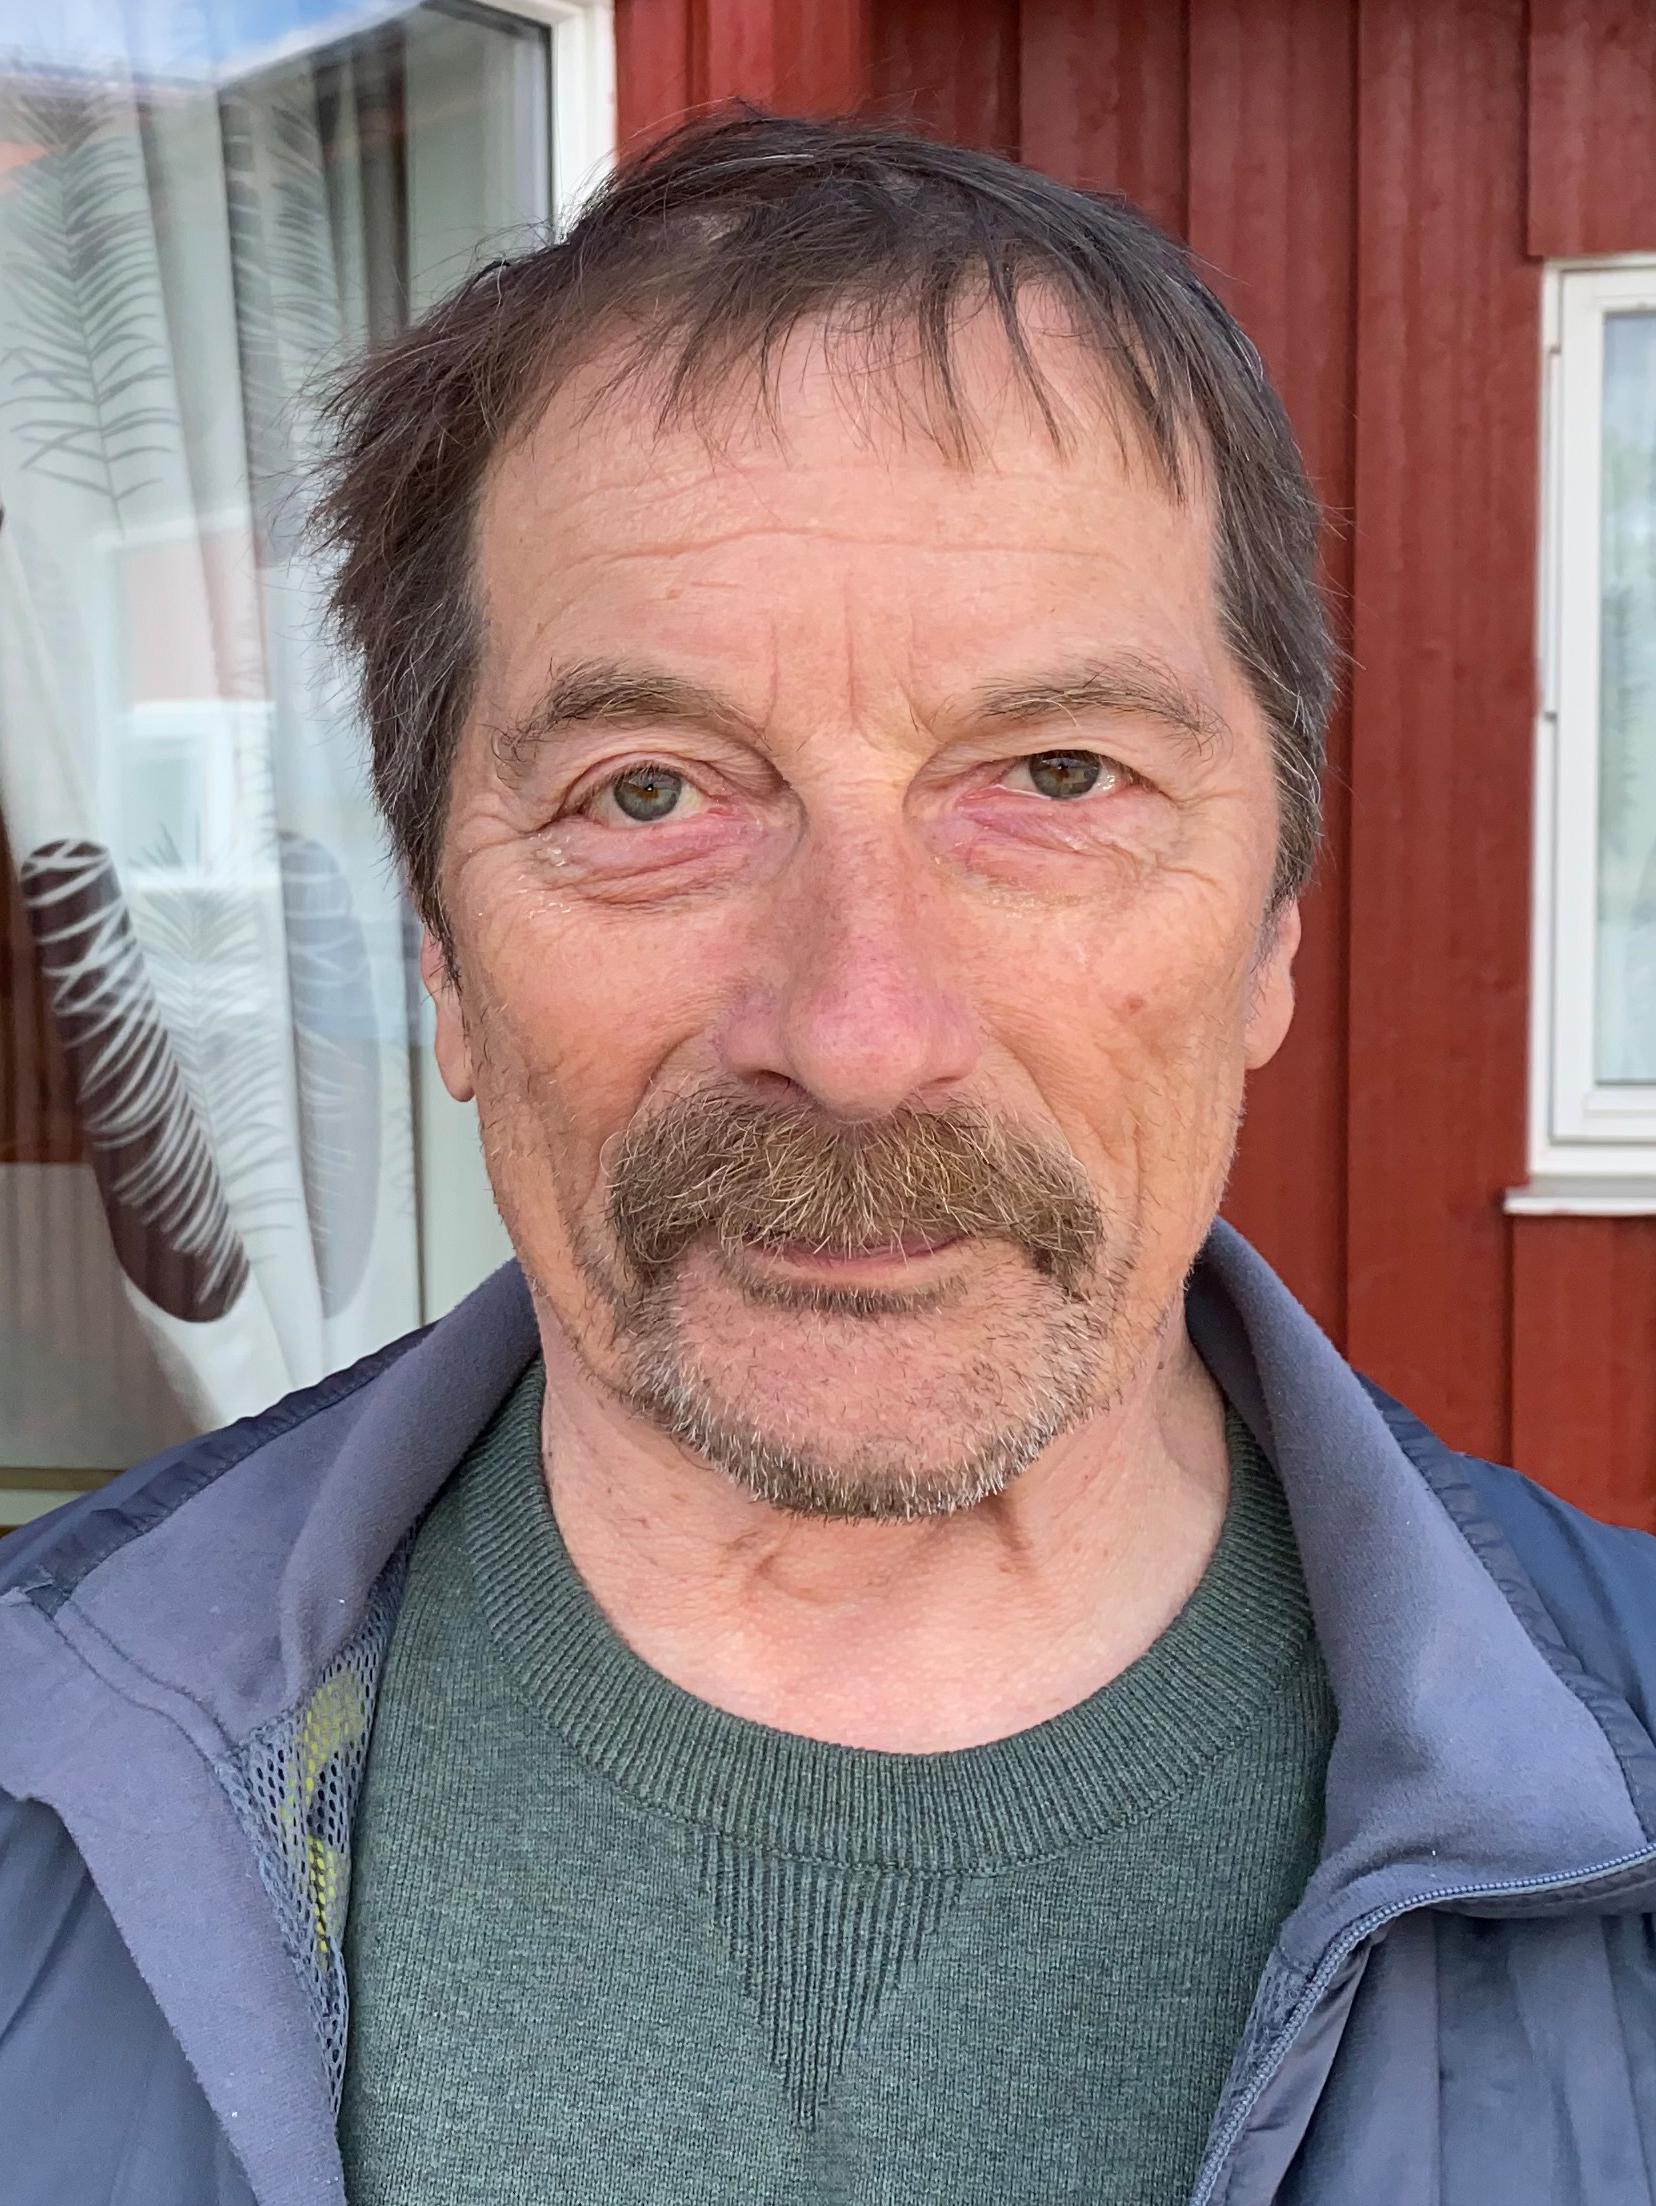 Rolf Trygve Johnsen